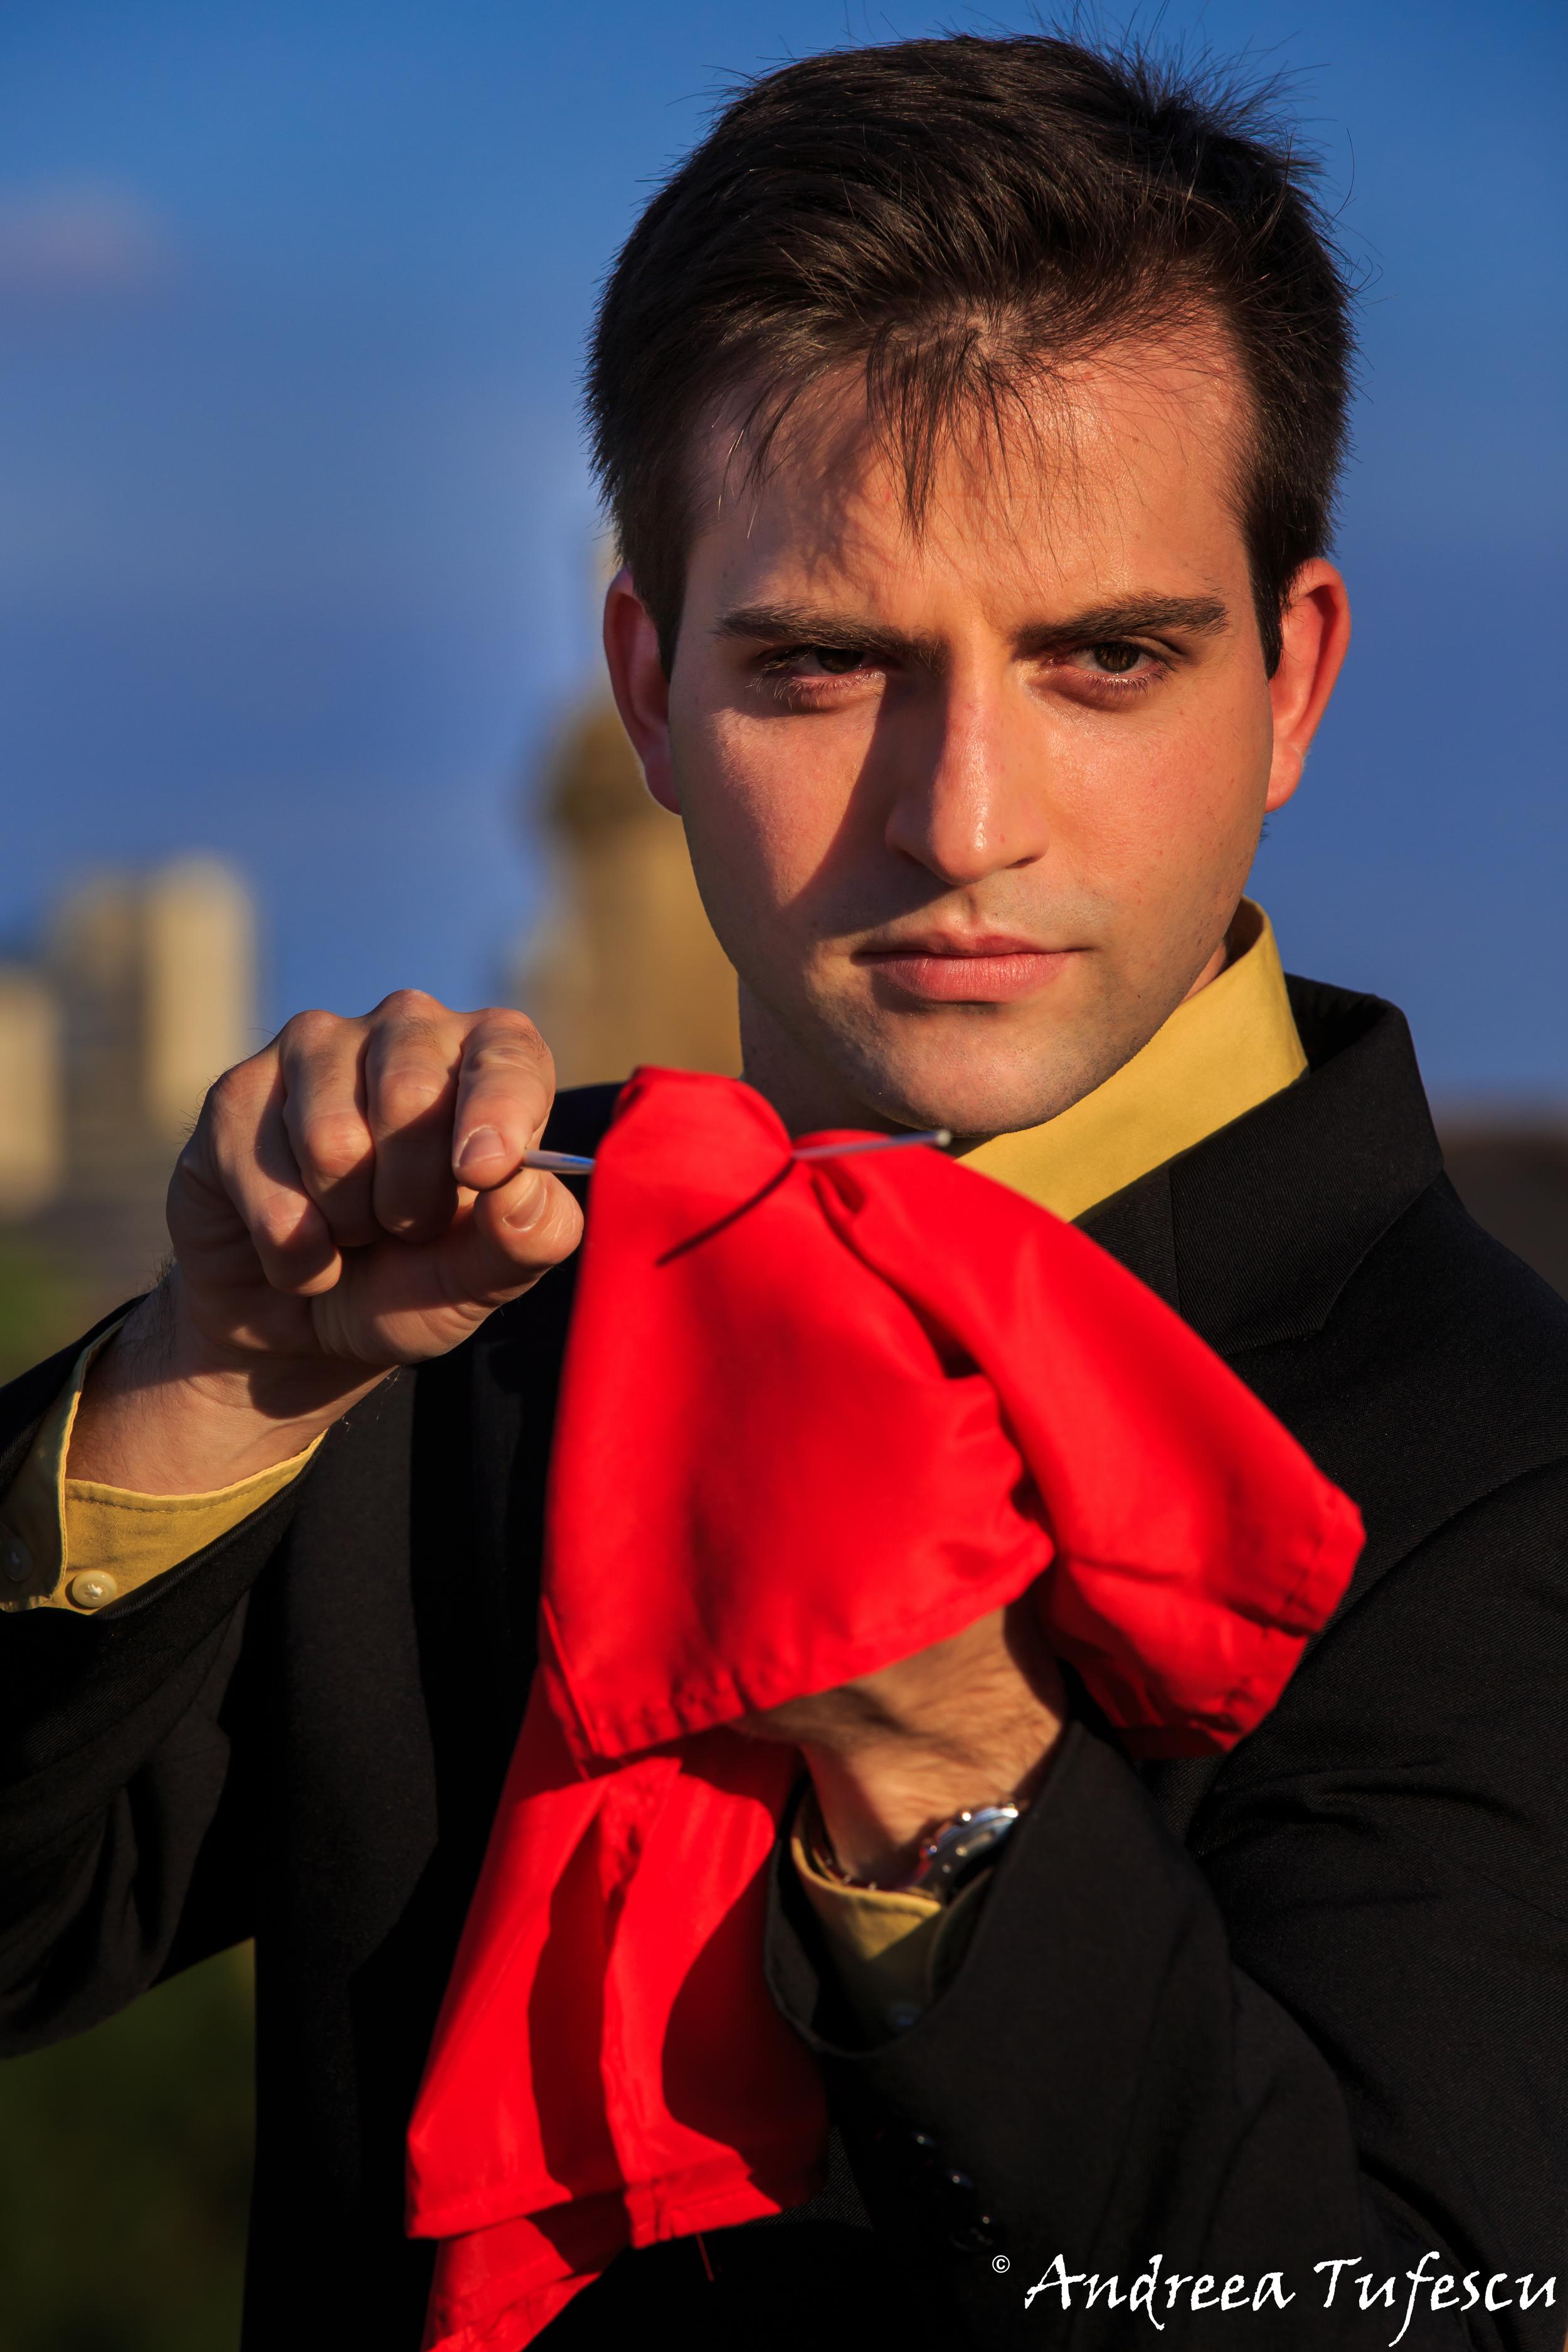 Conductor PABLO URBINA